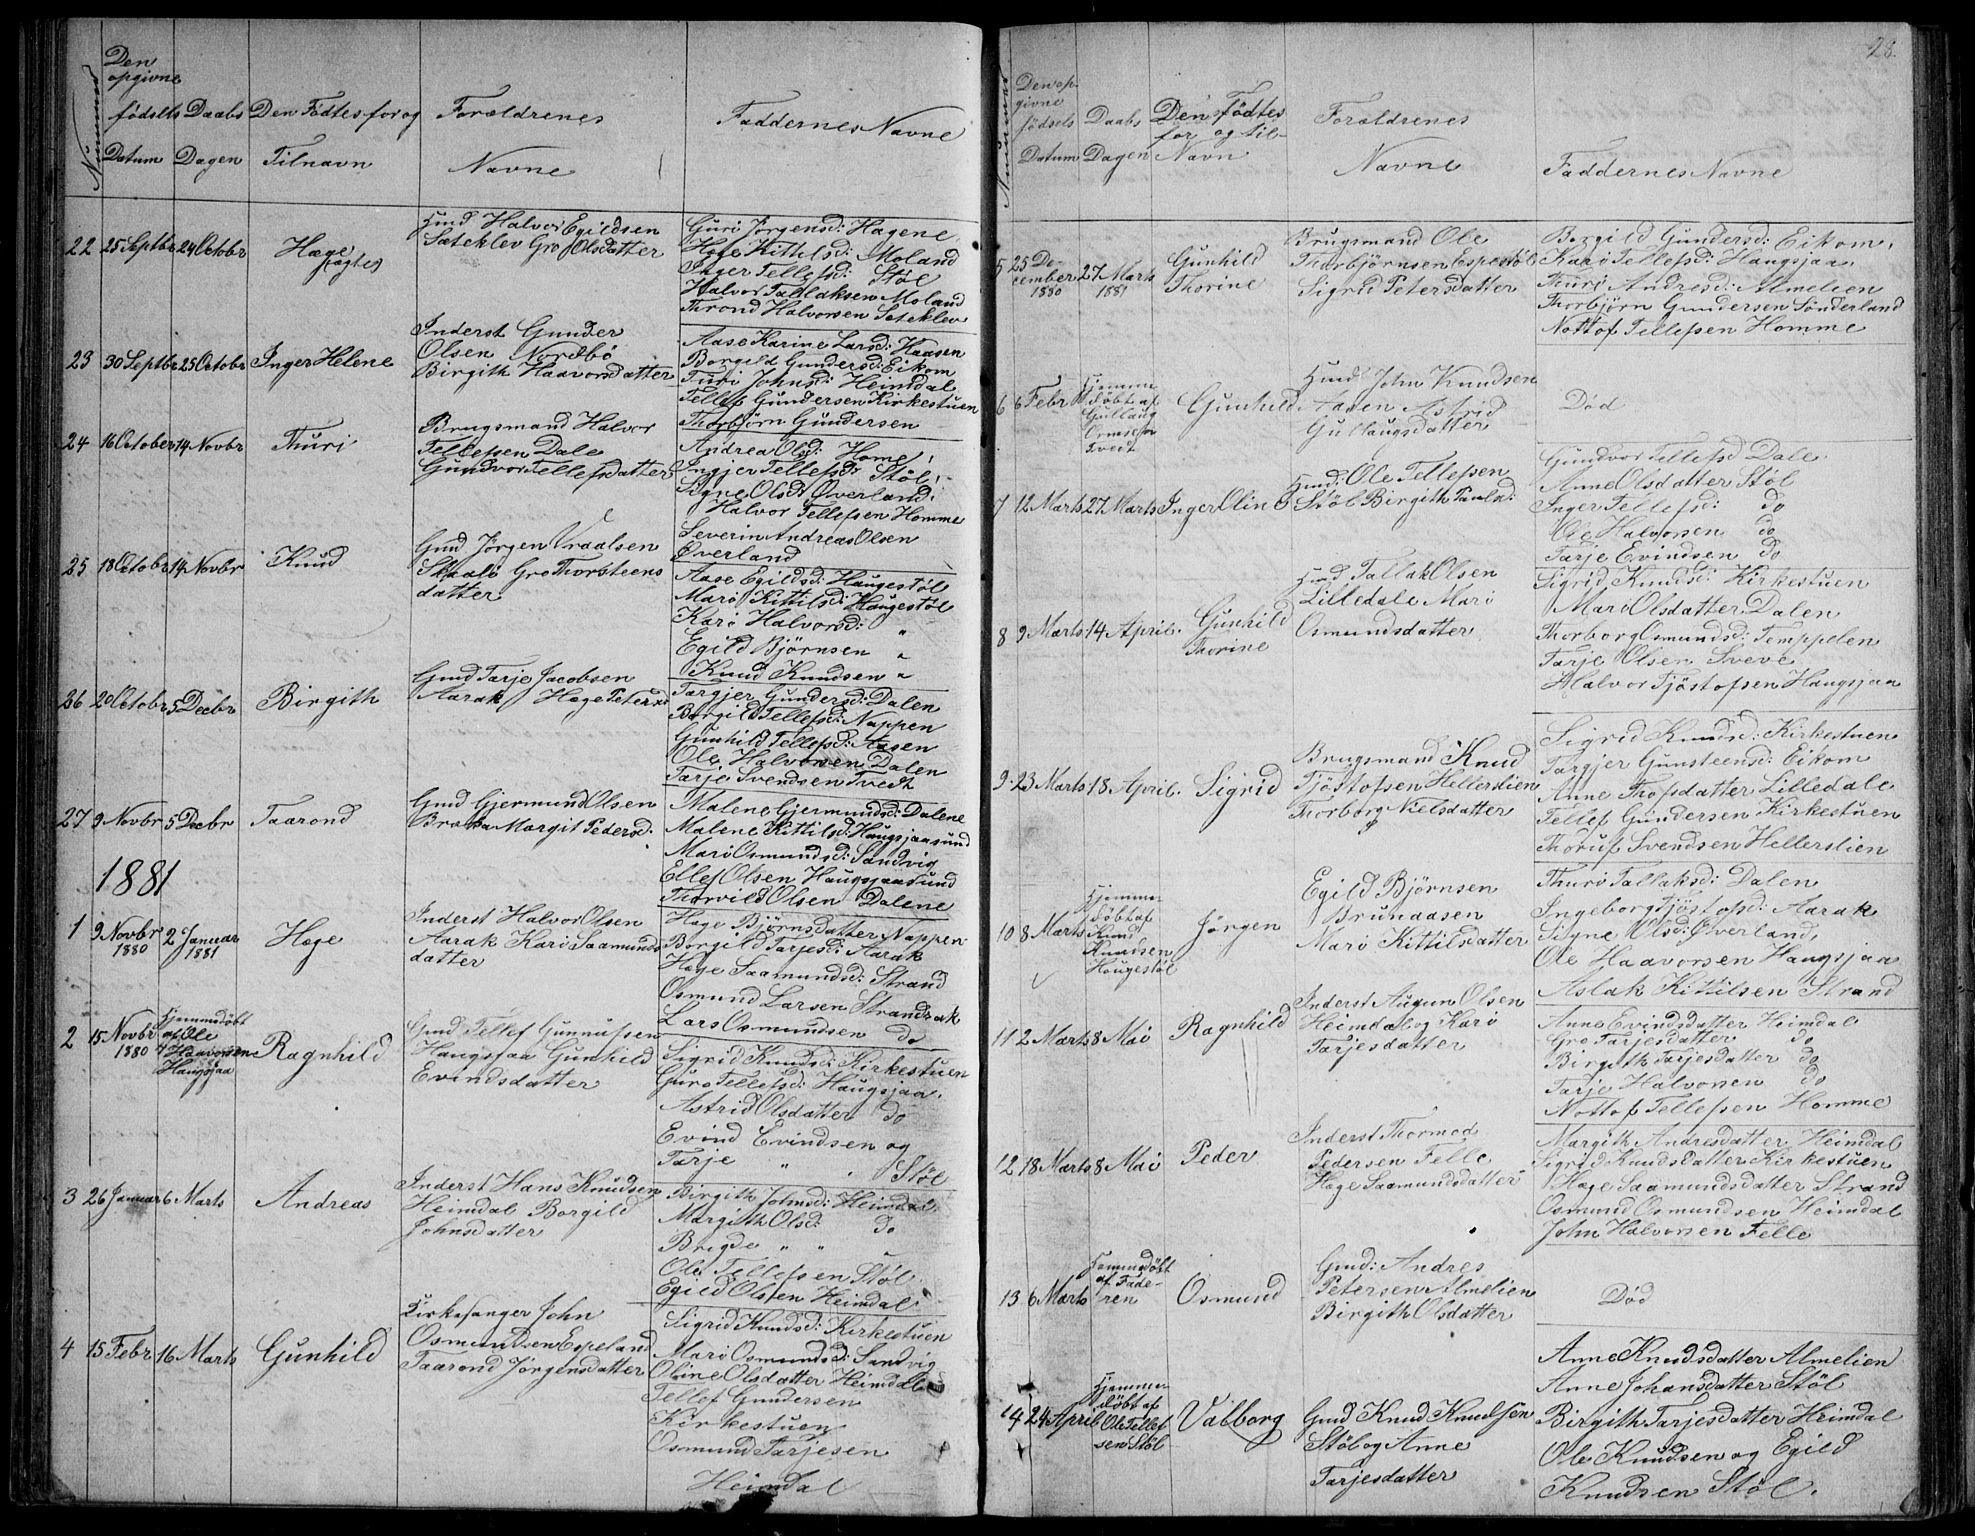 SAKO, Nissedal kirkebøker, G/Gb/L0002: Klokkerbok nr. II 2, 1863-1892, s. 28